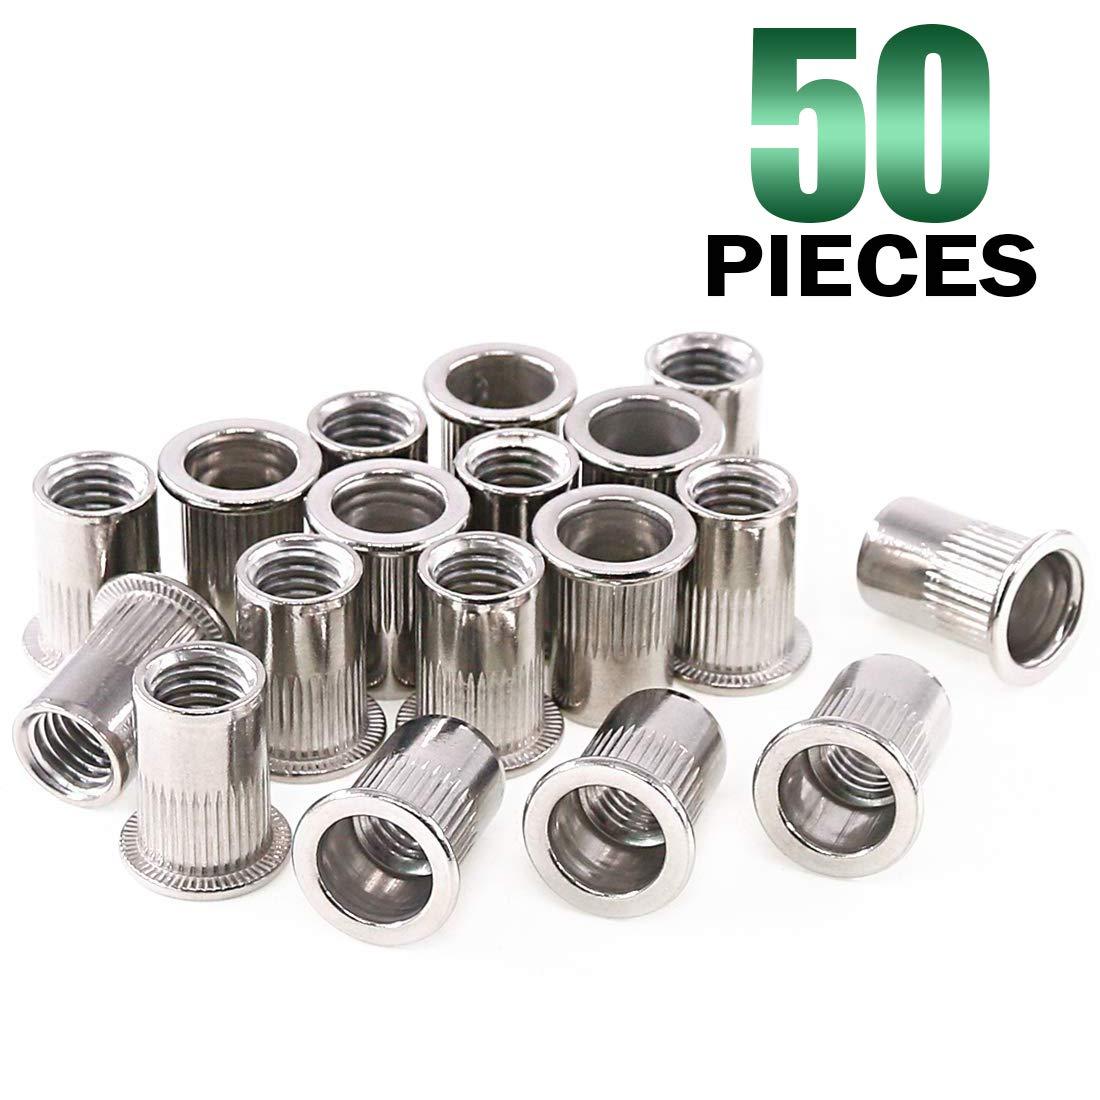 Keadic 50Pcs M10 Stainless Steel Metric Rivet Nut Flat Head Threaded Insert Nutsert Kit - M10 by Keadic